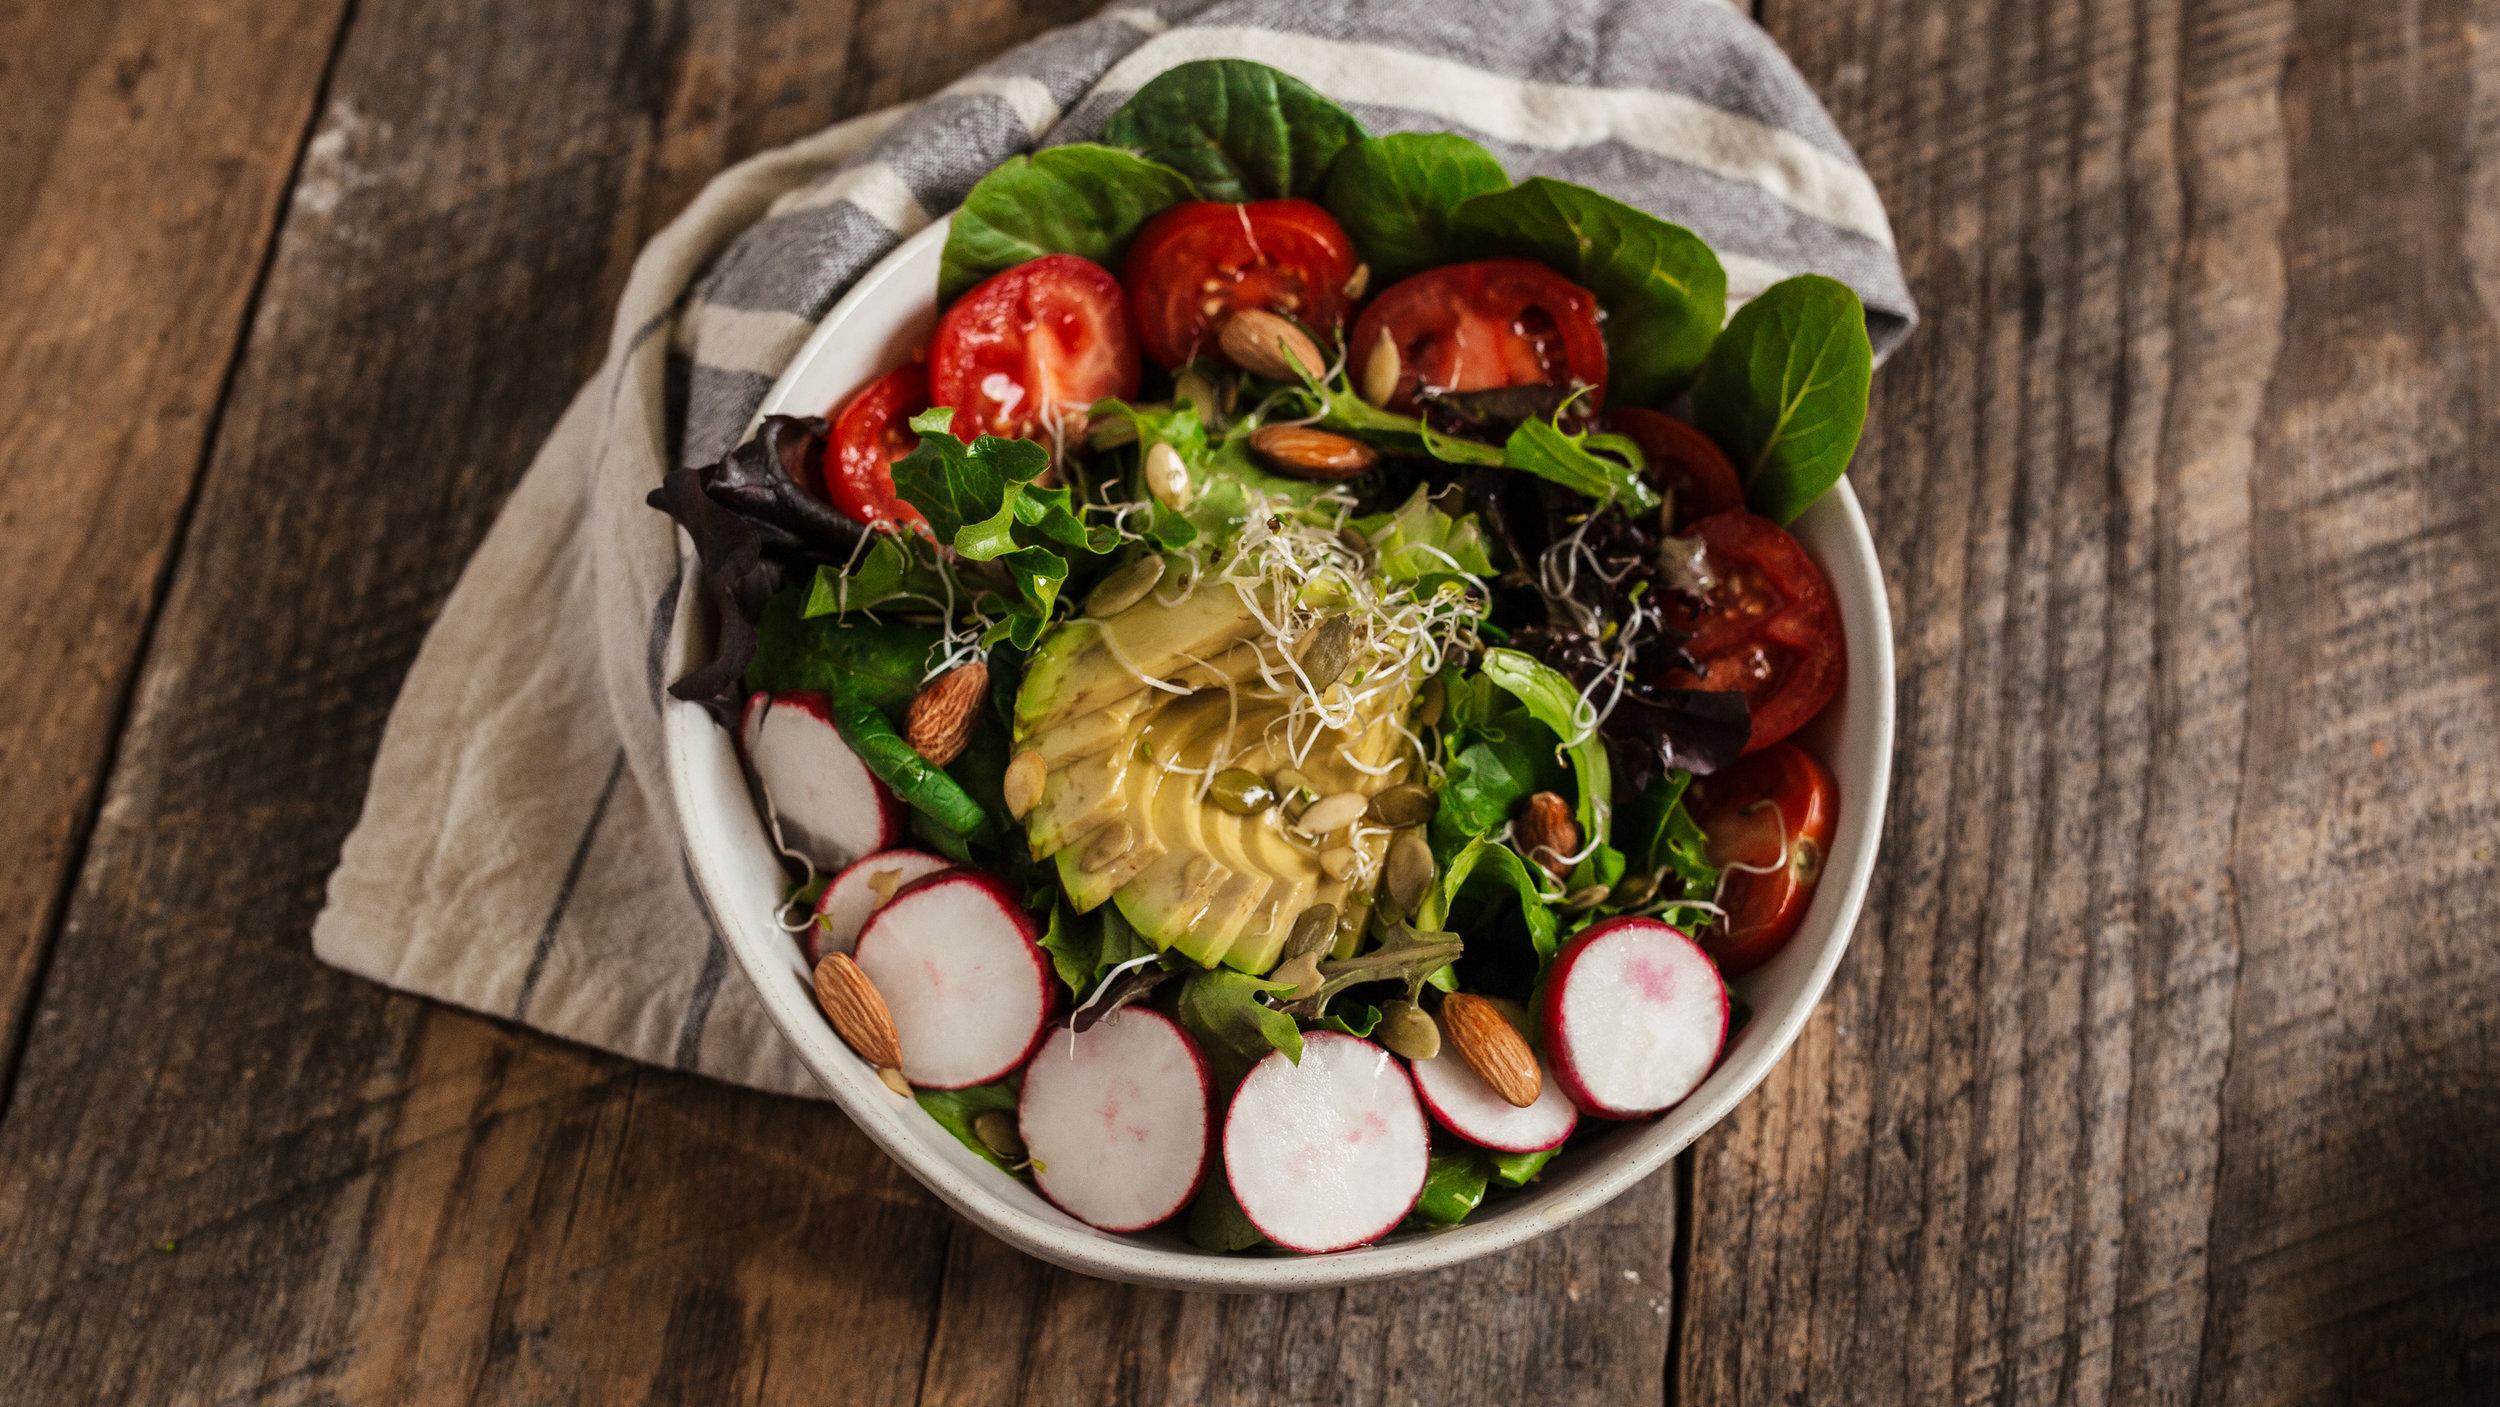 Dinner 4: Healthy Nut Salad